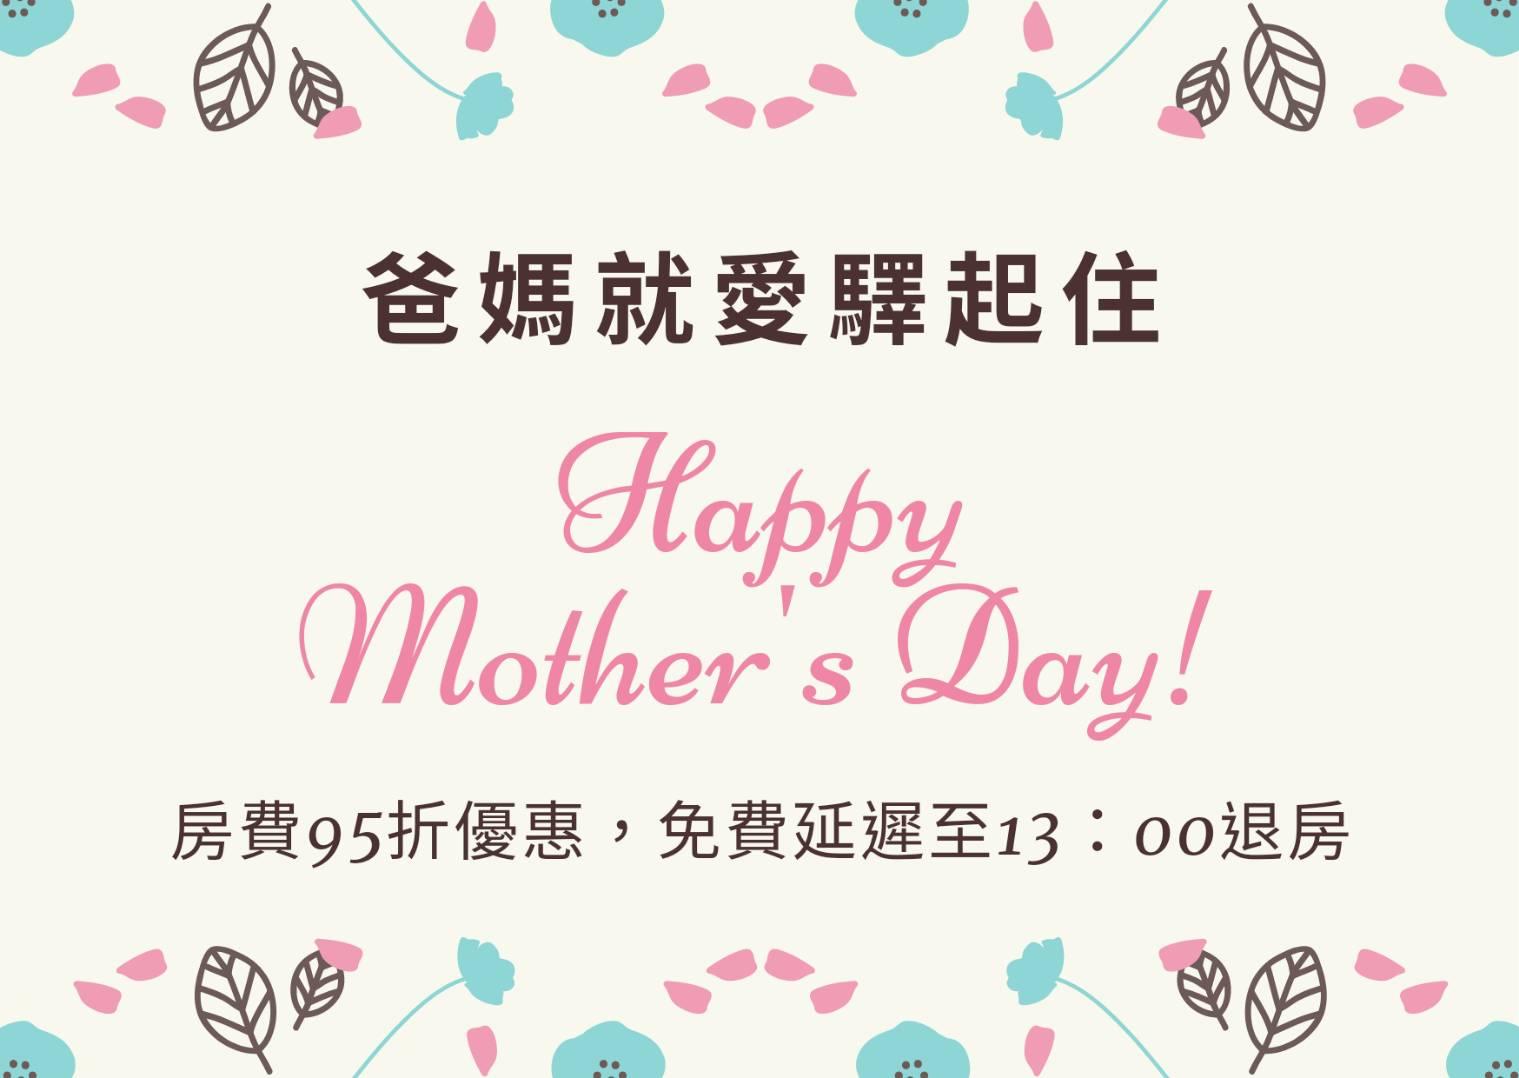 https://booking.taipeiinngroup.com/nv/images/suite/943.jpg